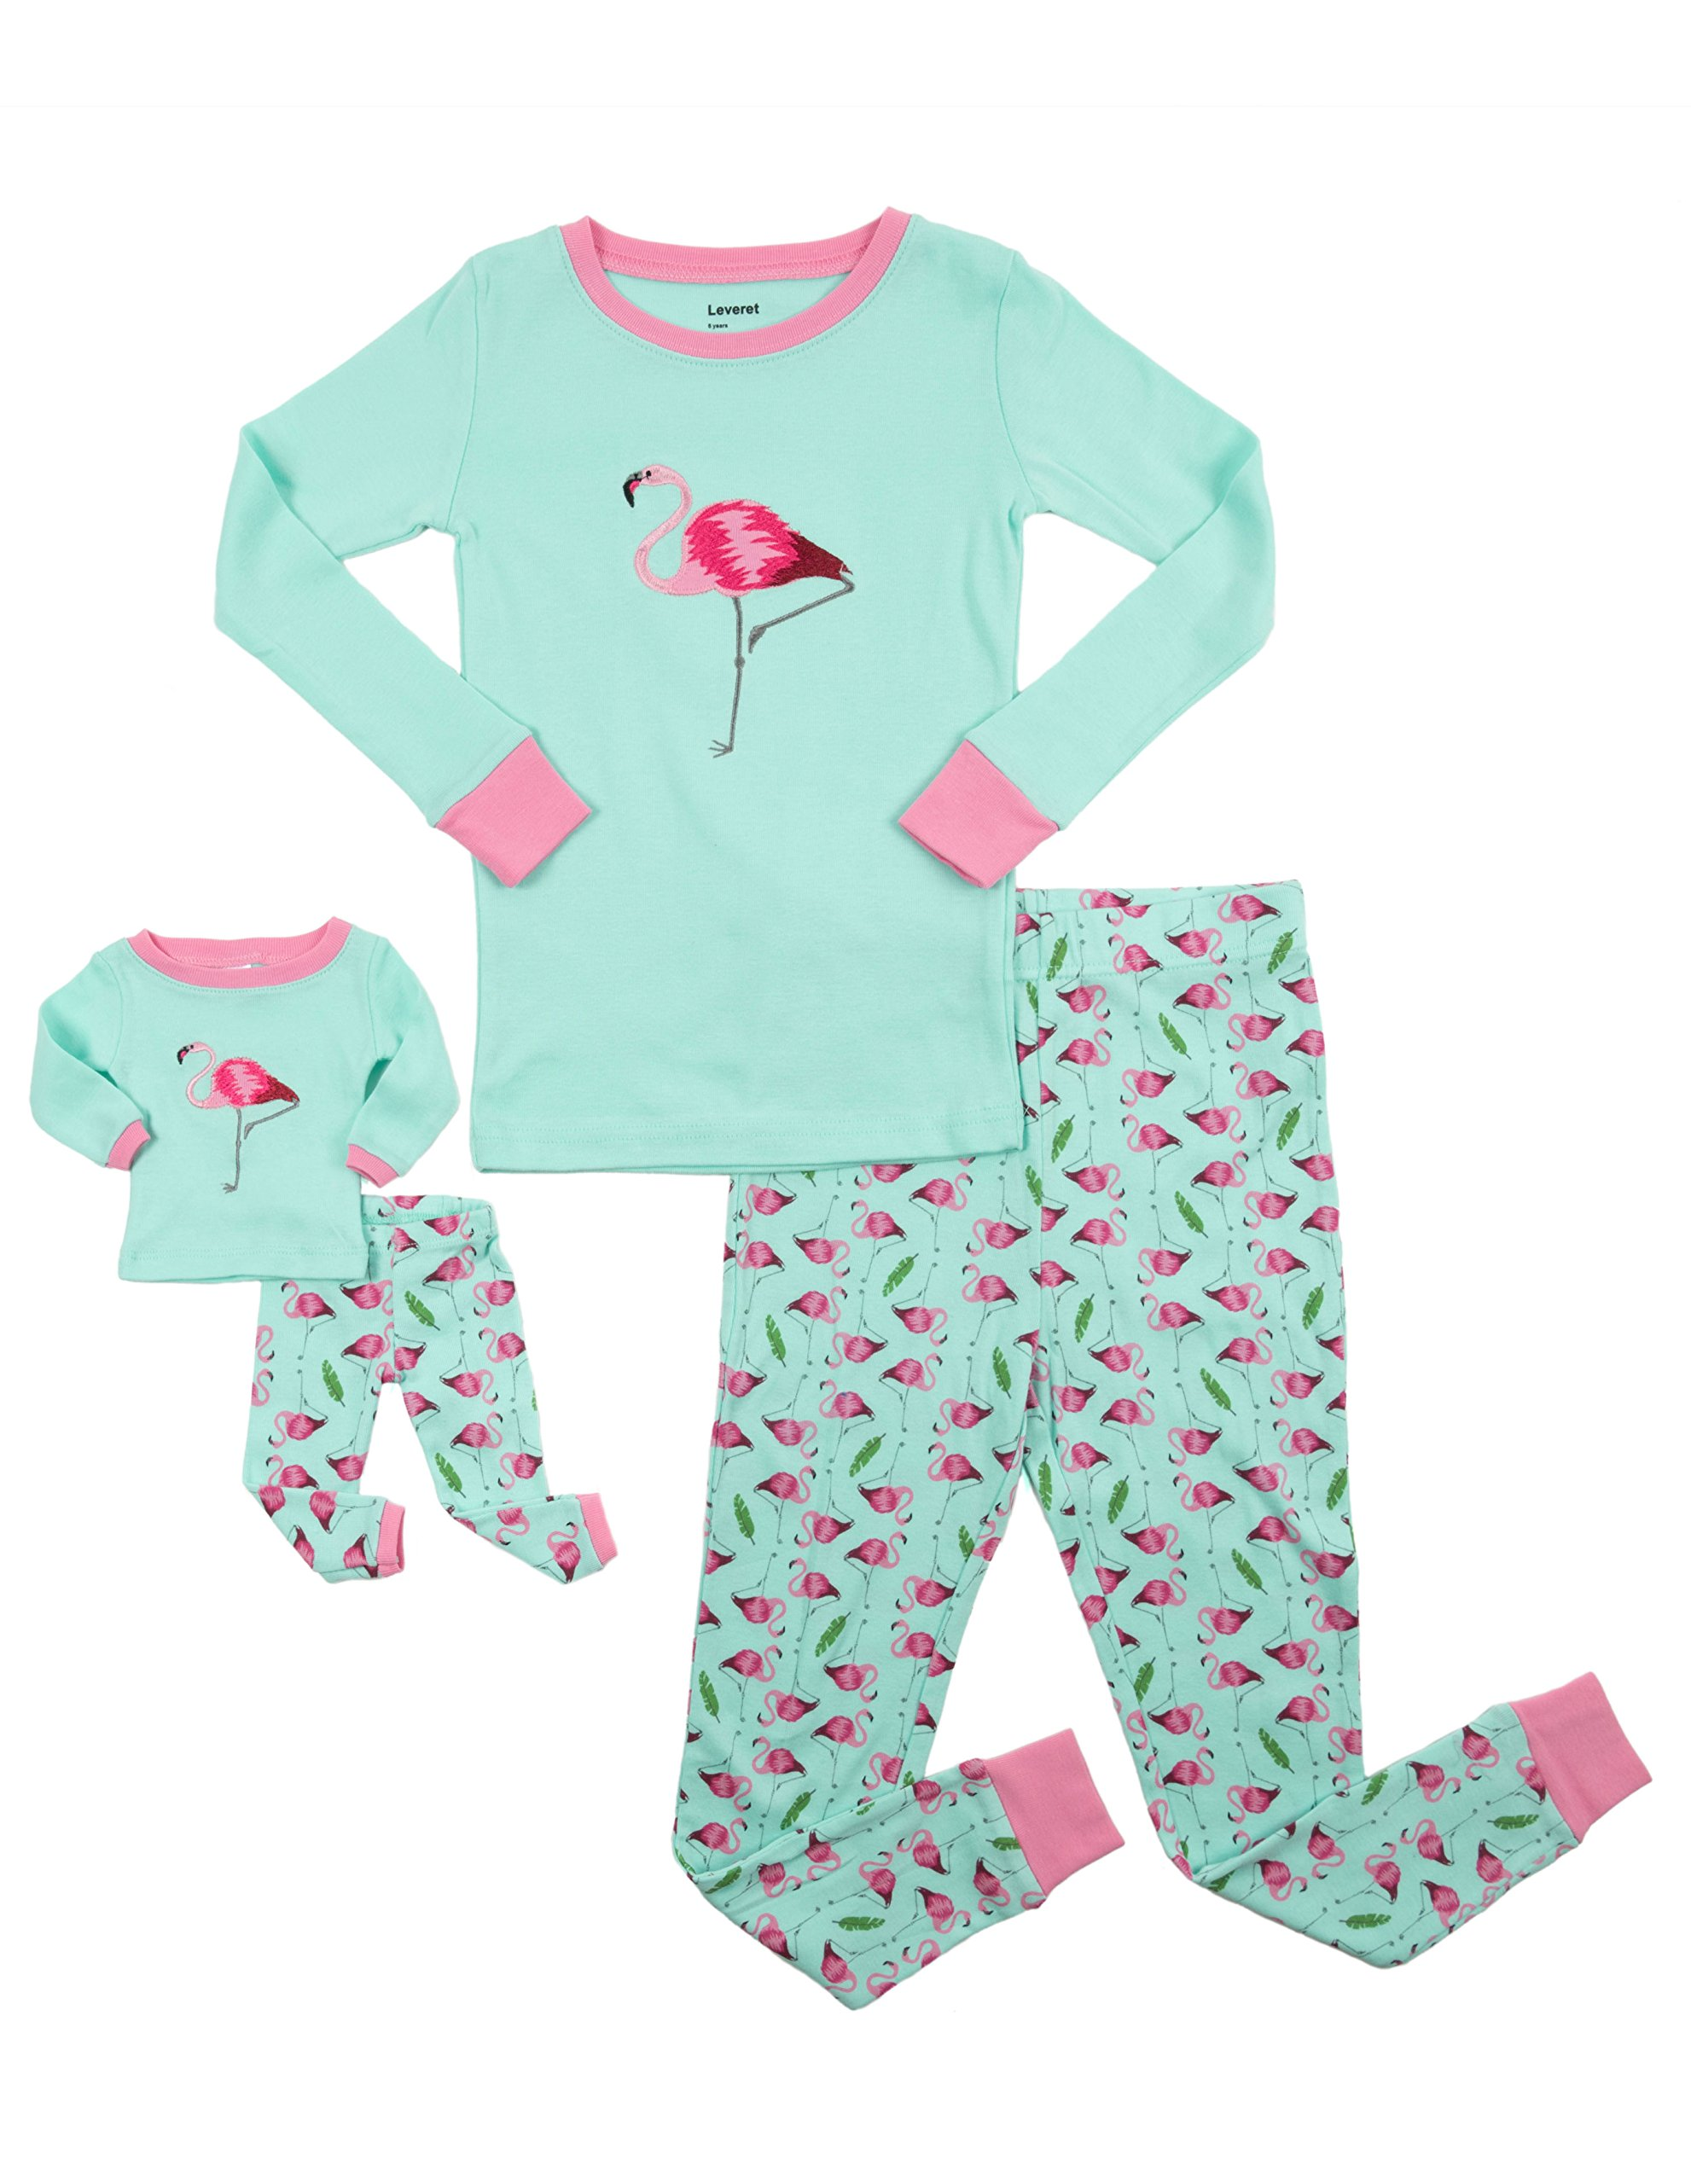 Leveret Matching Doll & Girl Flamingo 2 Piece Pajama Set 100% Cotton Size 10 Years